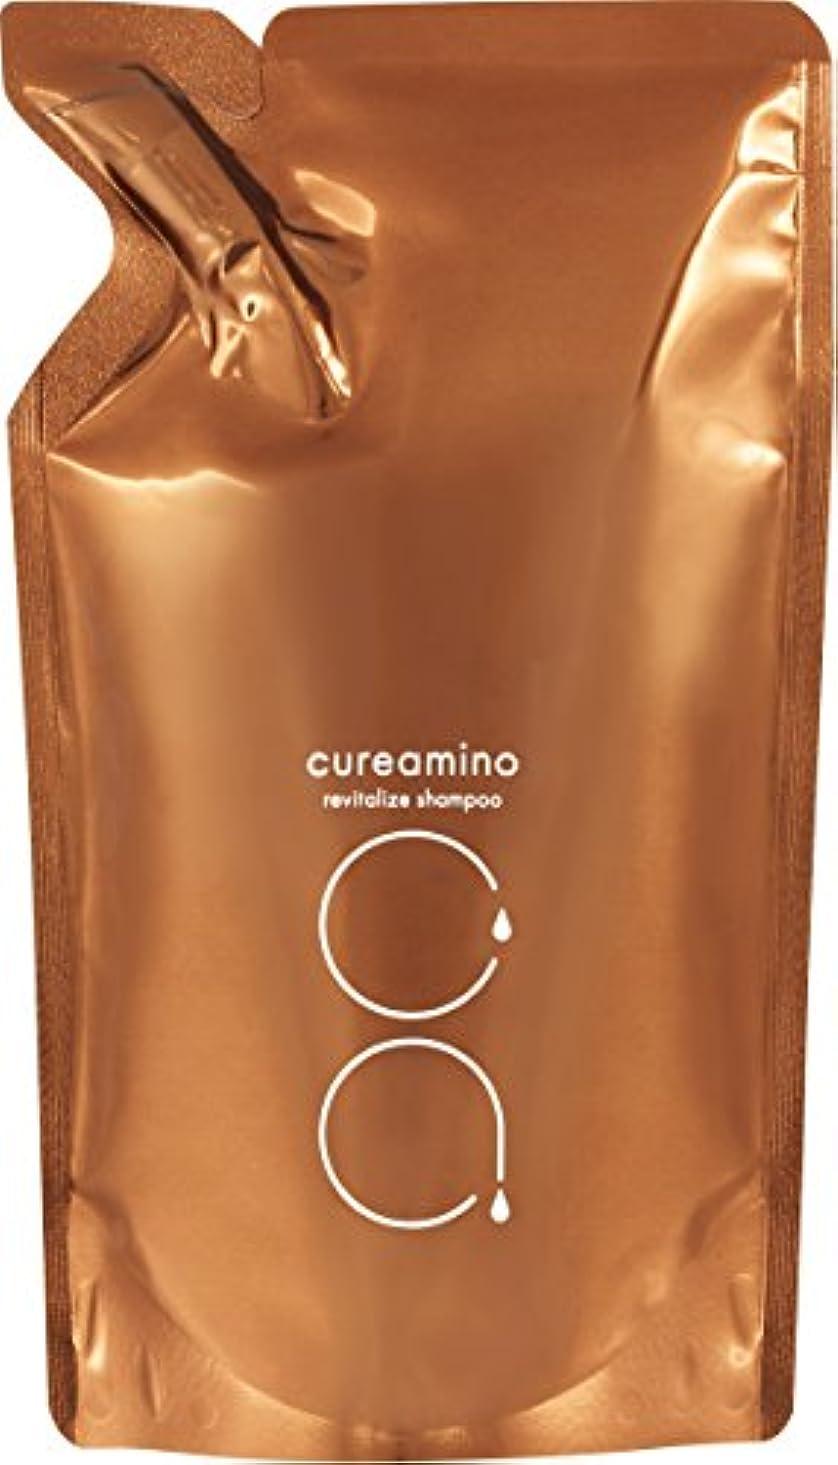 cureamino(キュアミノ) リバイタライズシャンプー 詰替 400ML